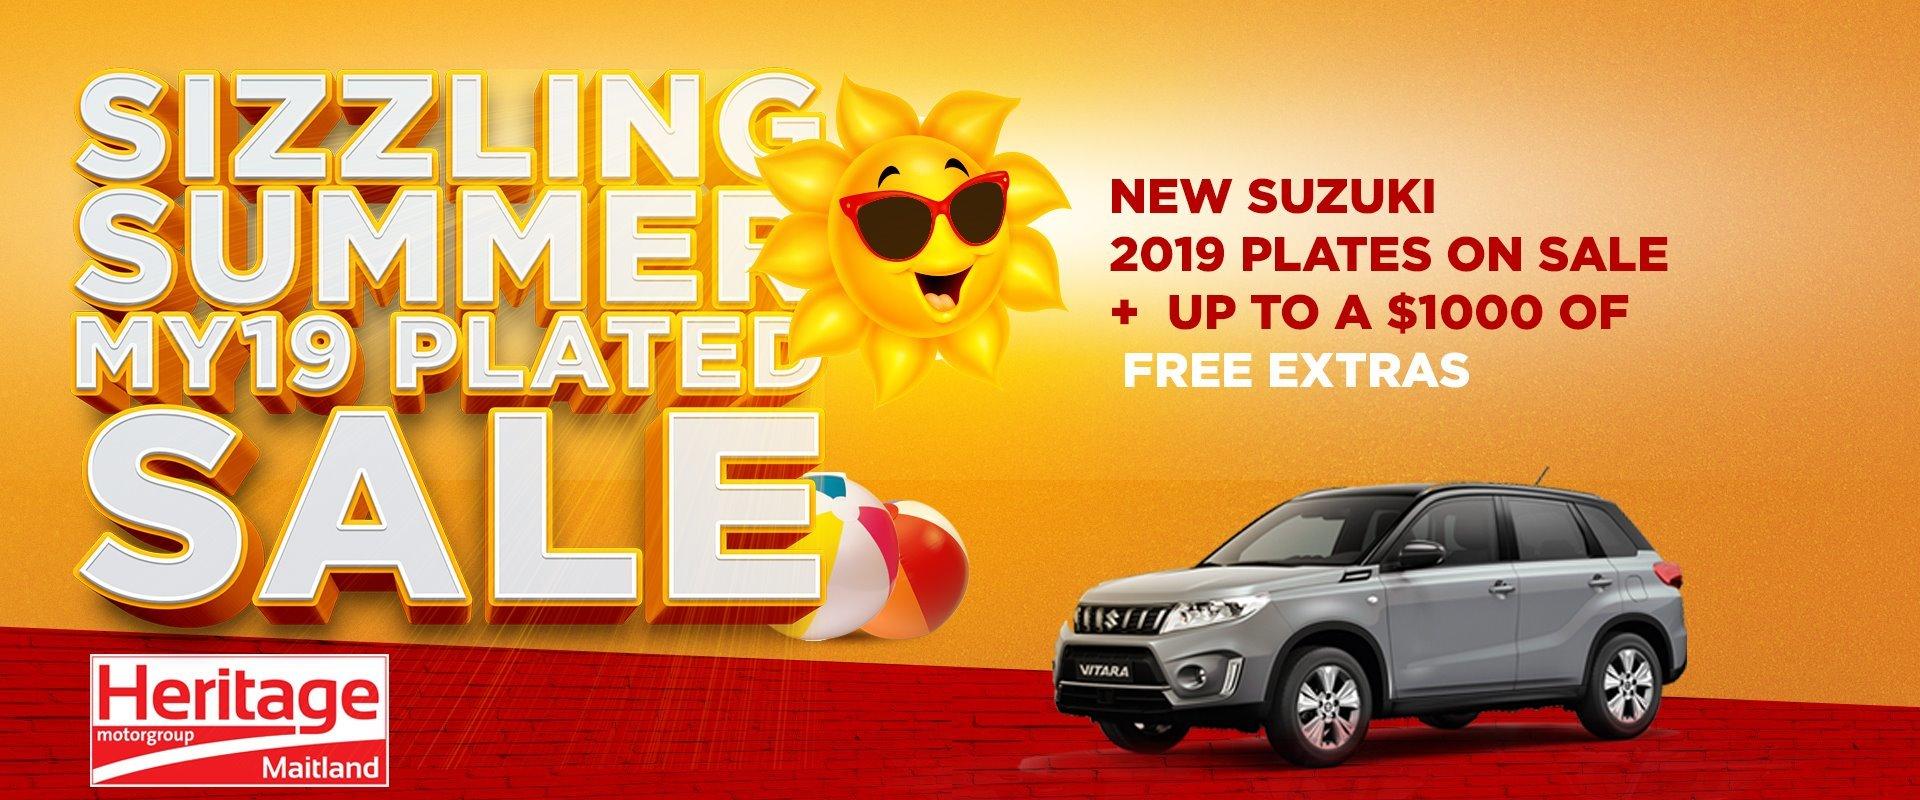 2019 Plate Clearance Sale Suzuki, Vitara, Baleno, Swift, Maitland, Newcastle, Kurri Kurrin, Cessnock